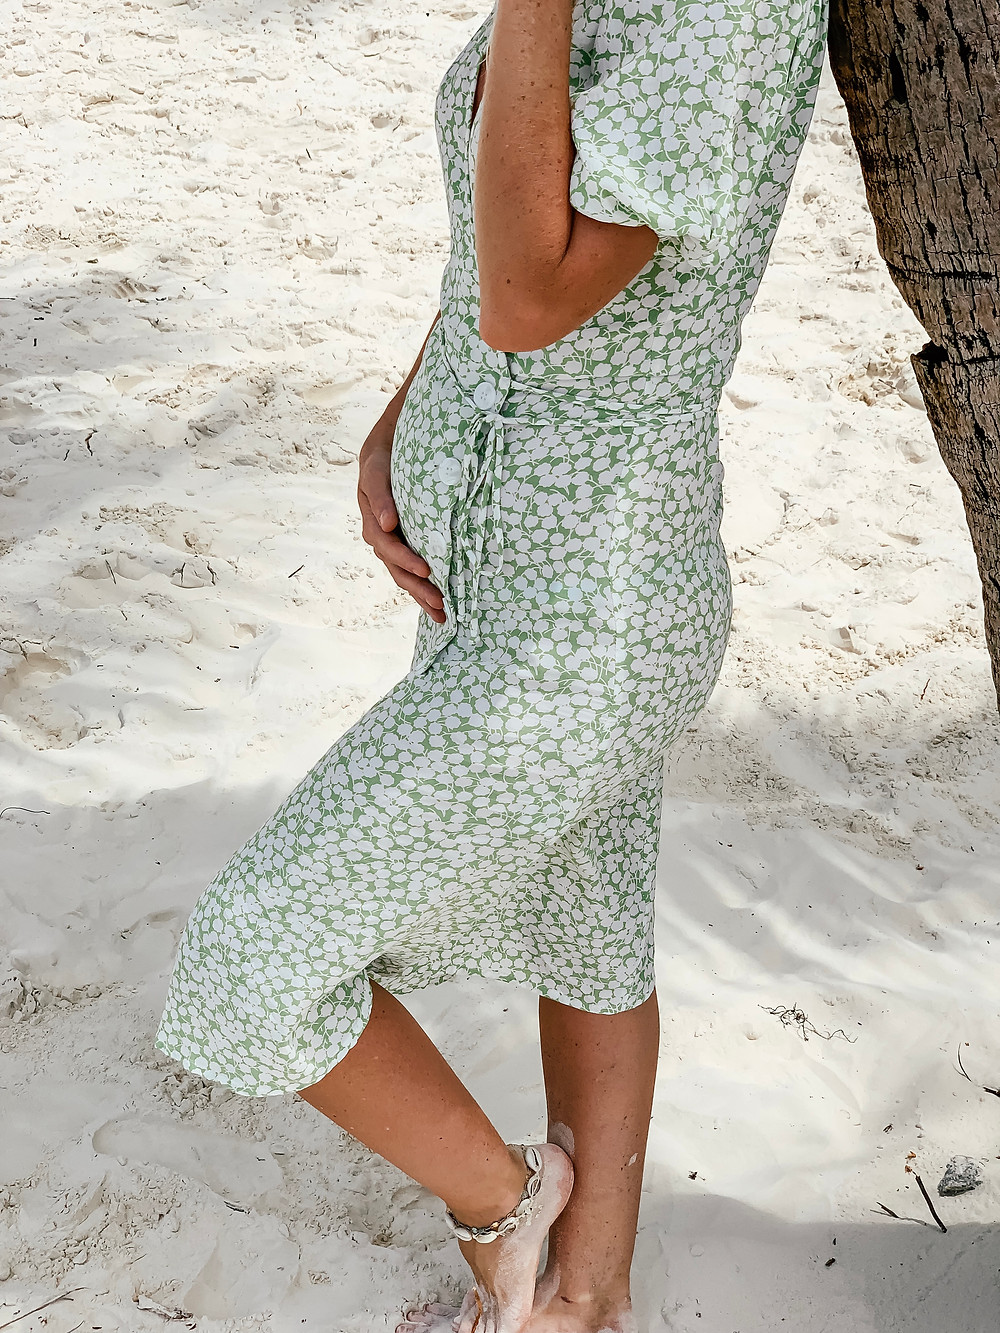 I'm PREGNANT l Pregnancy Announcement l A Style Alike l Faithfull The Brand Dress